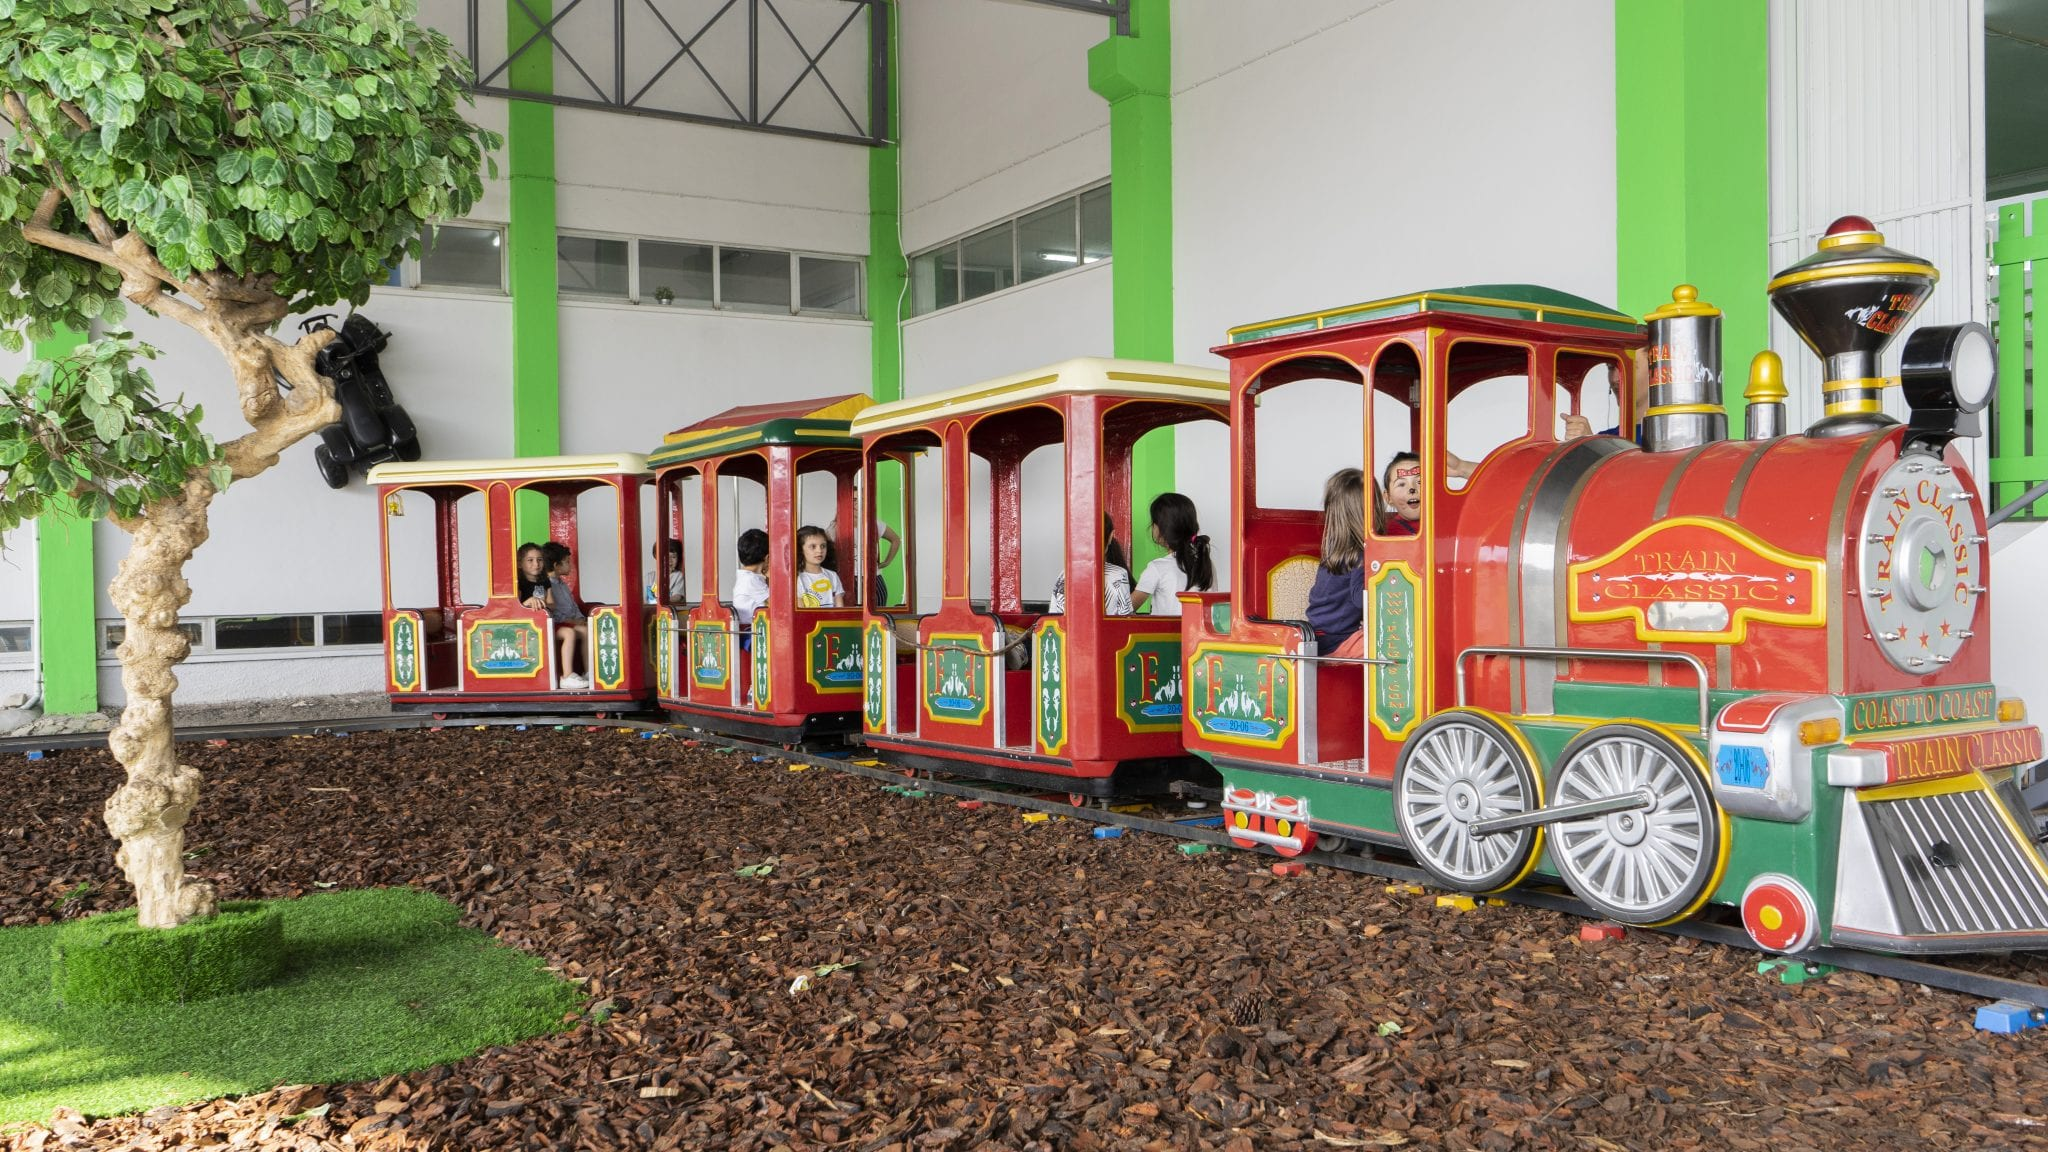 Comboio Feijão Verde Coimbra